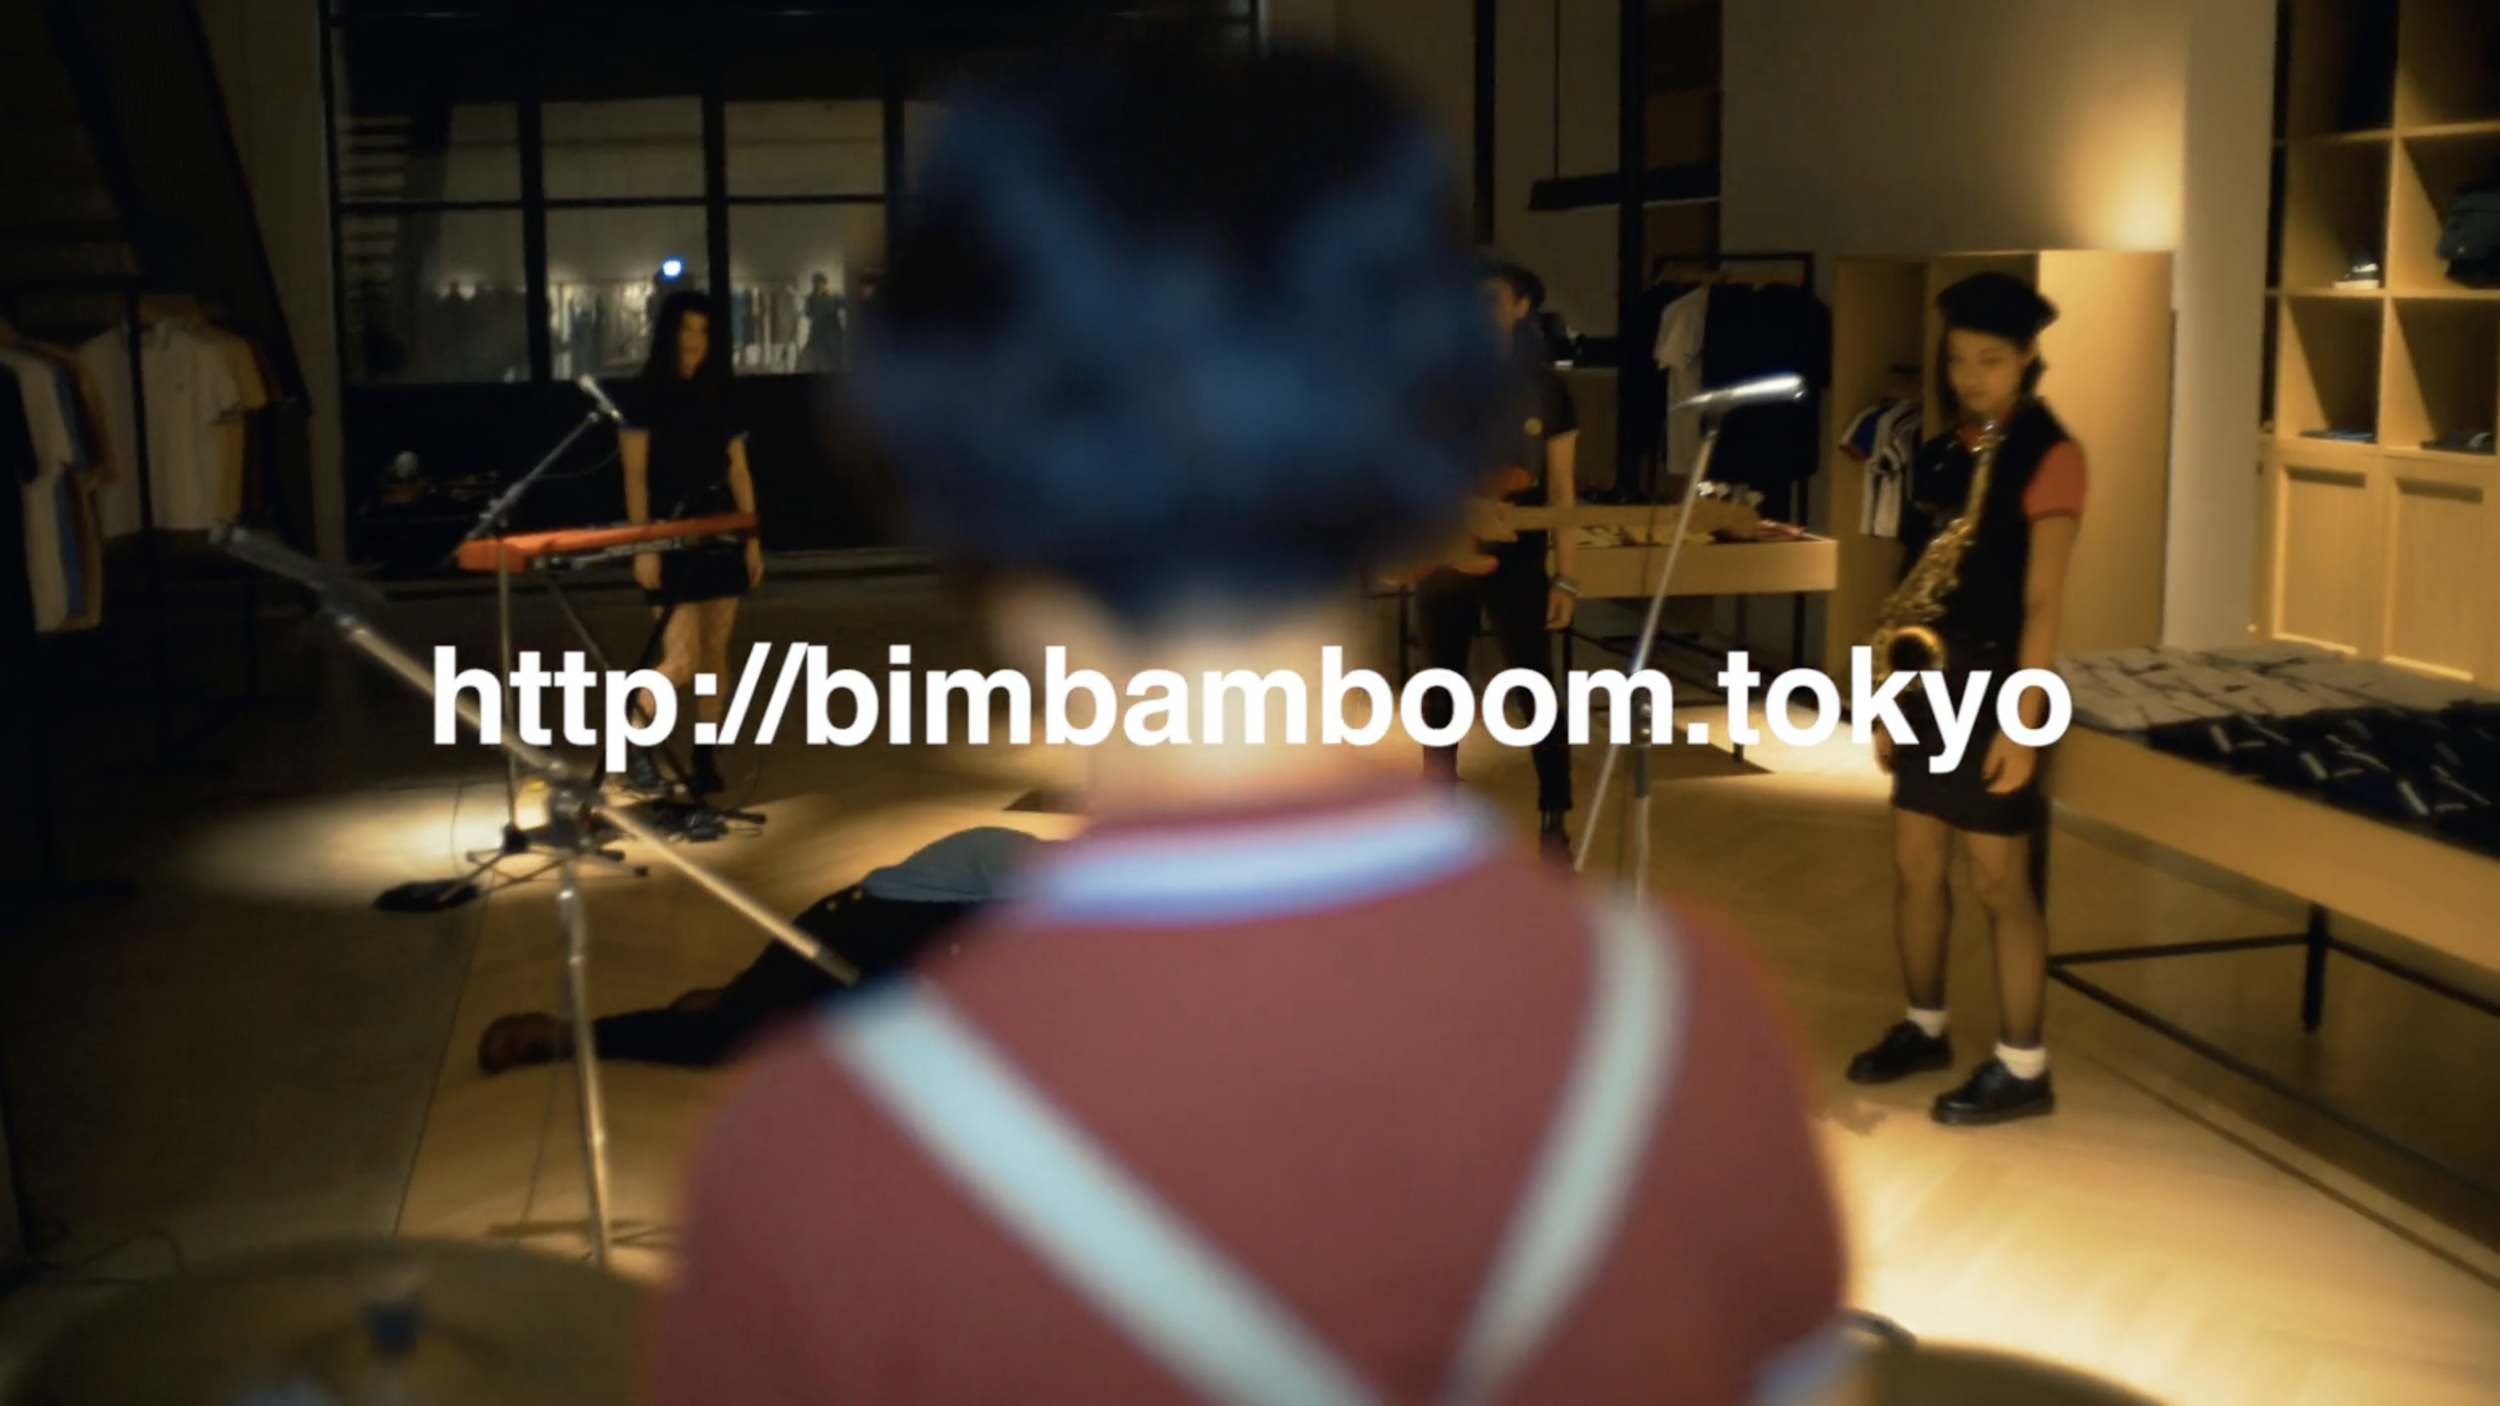 "BimBamBoom ""Shinzo BakuBaku Ochokochoi"""